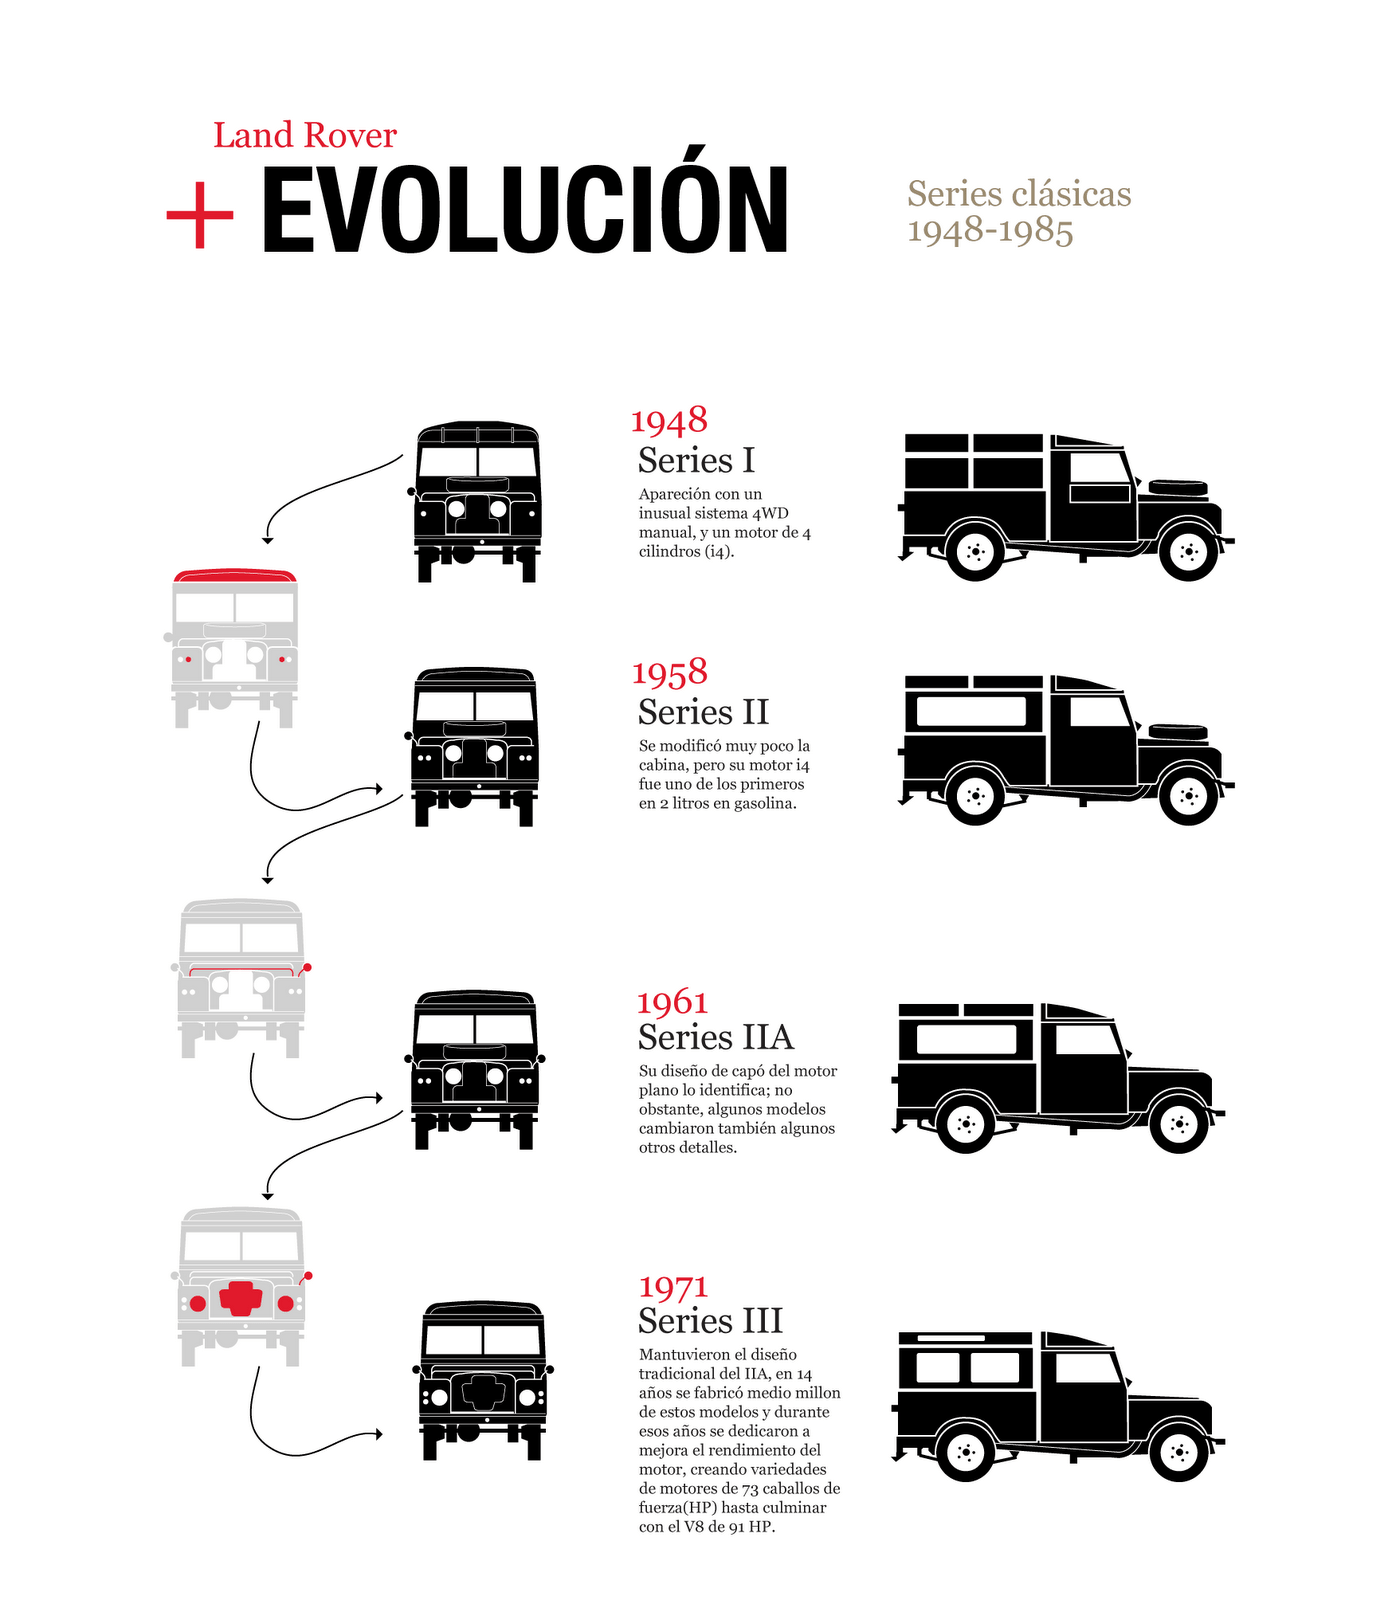 Land Rover Evolution